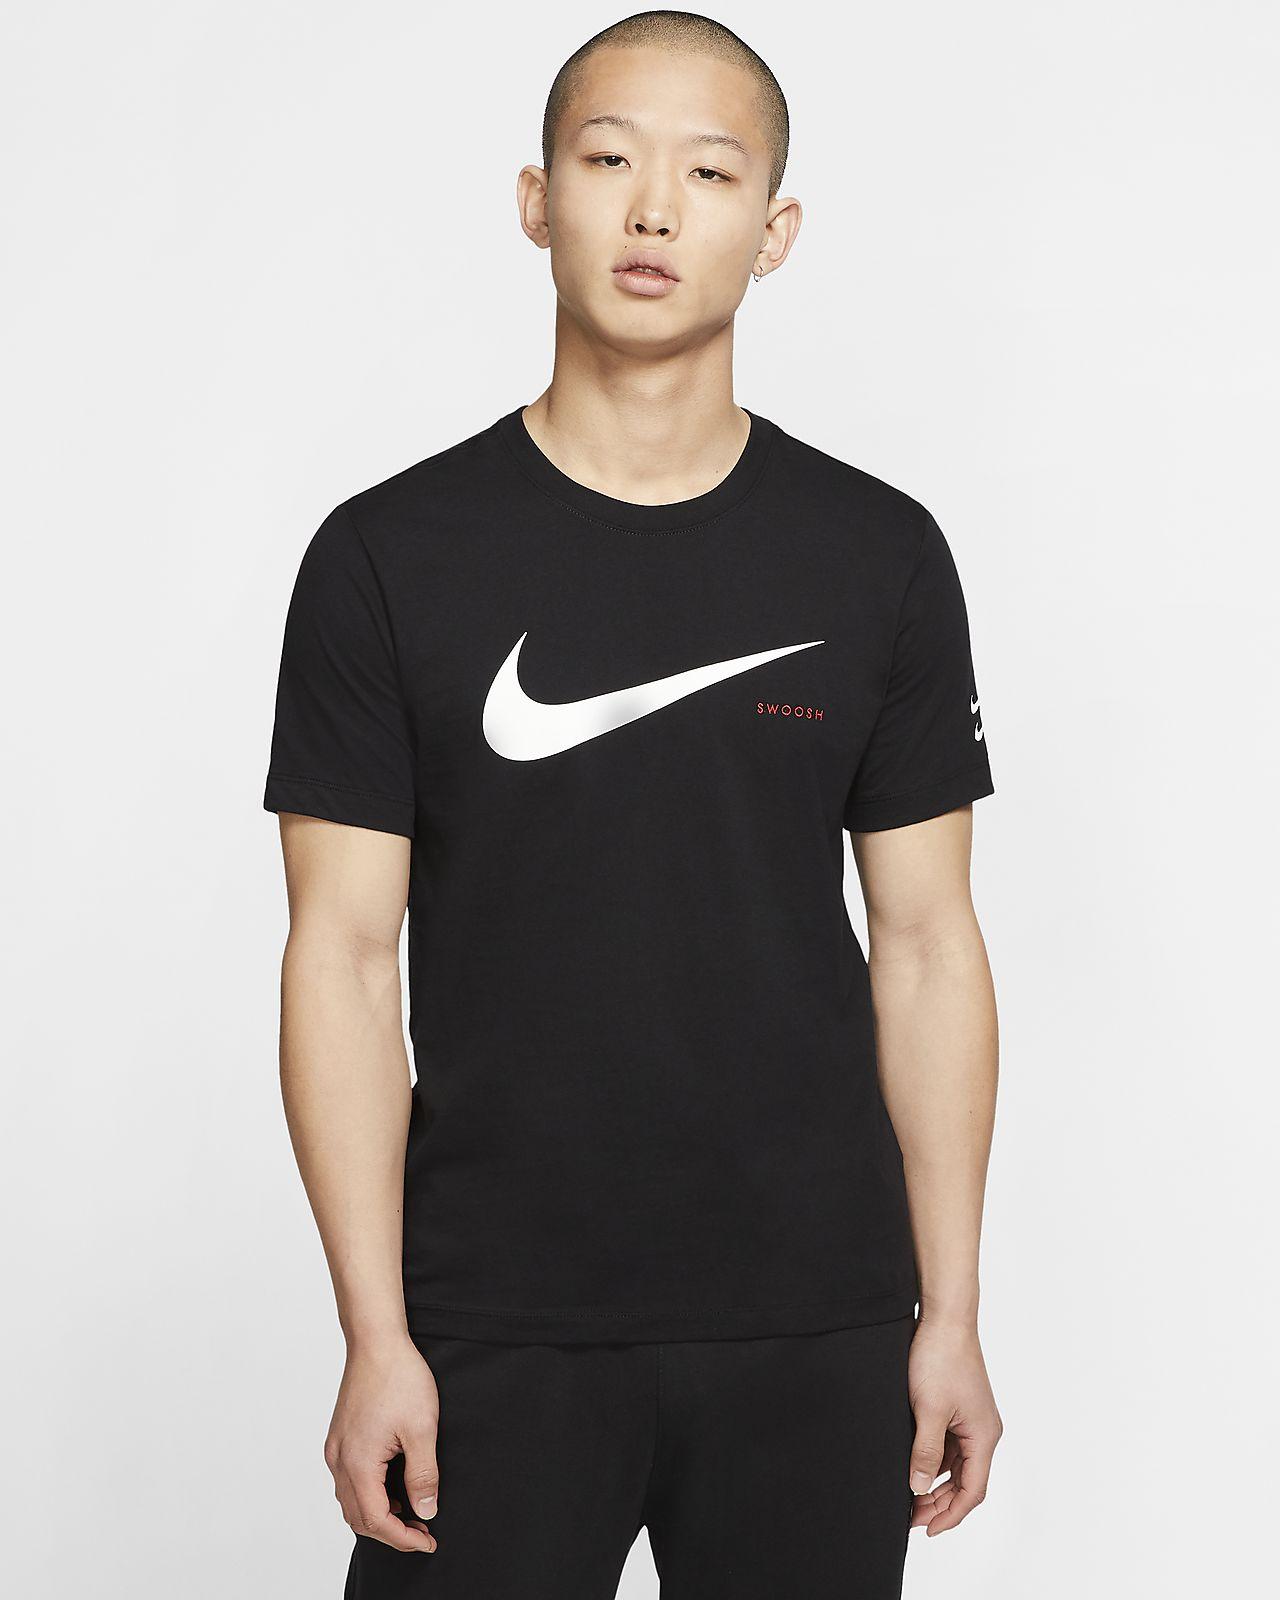 t-shirt nike simple